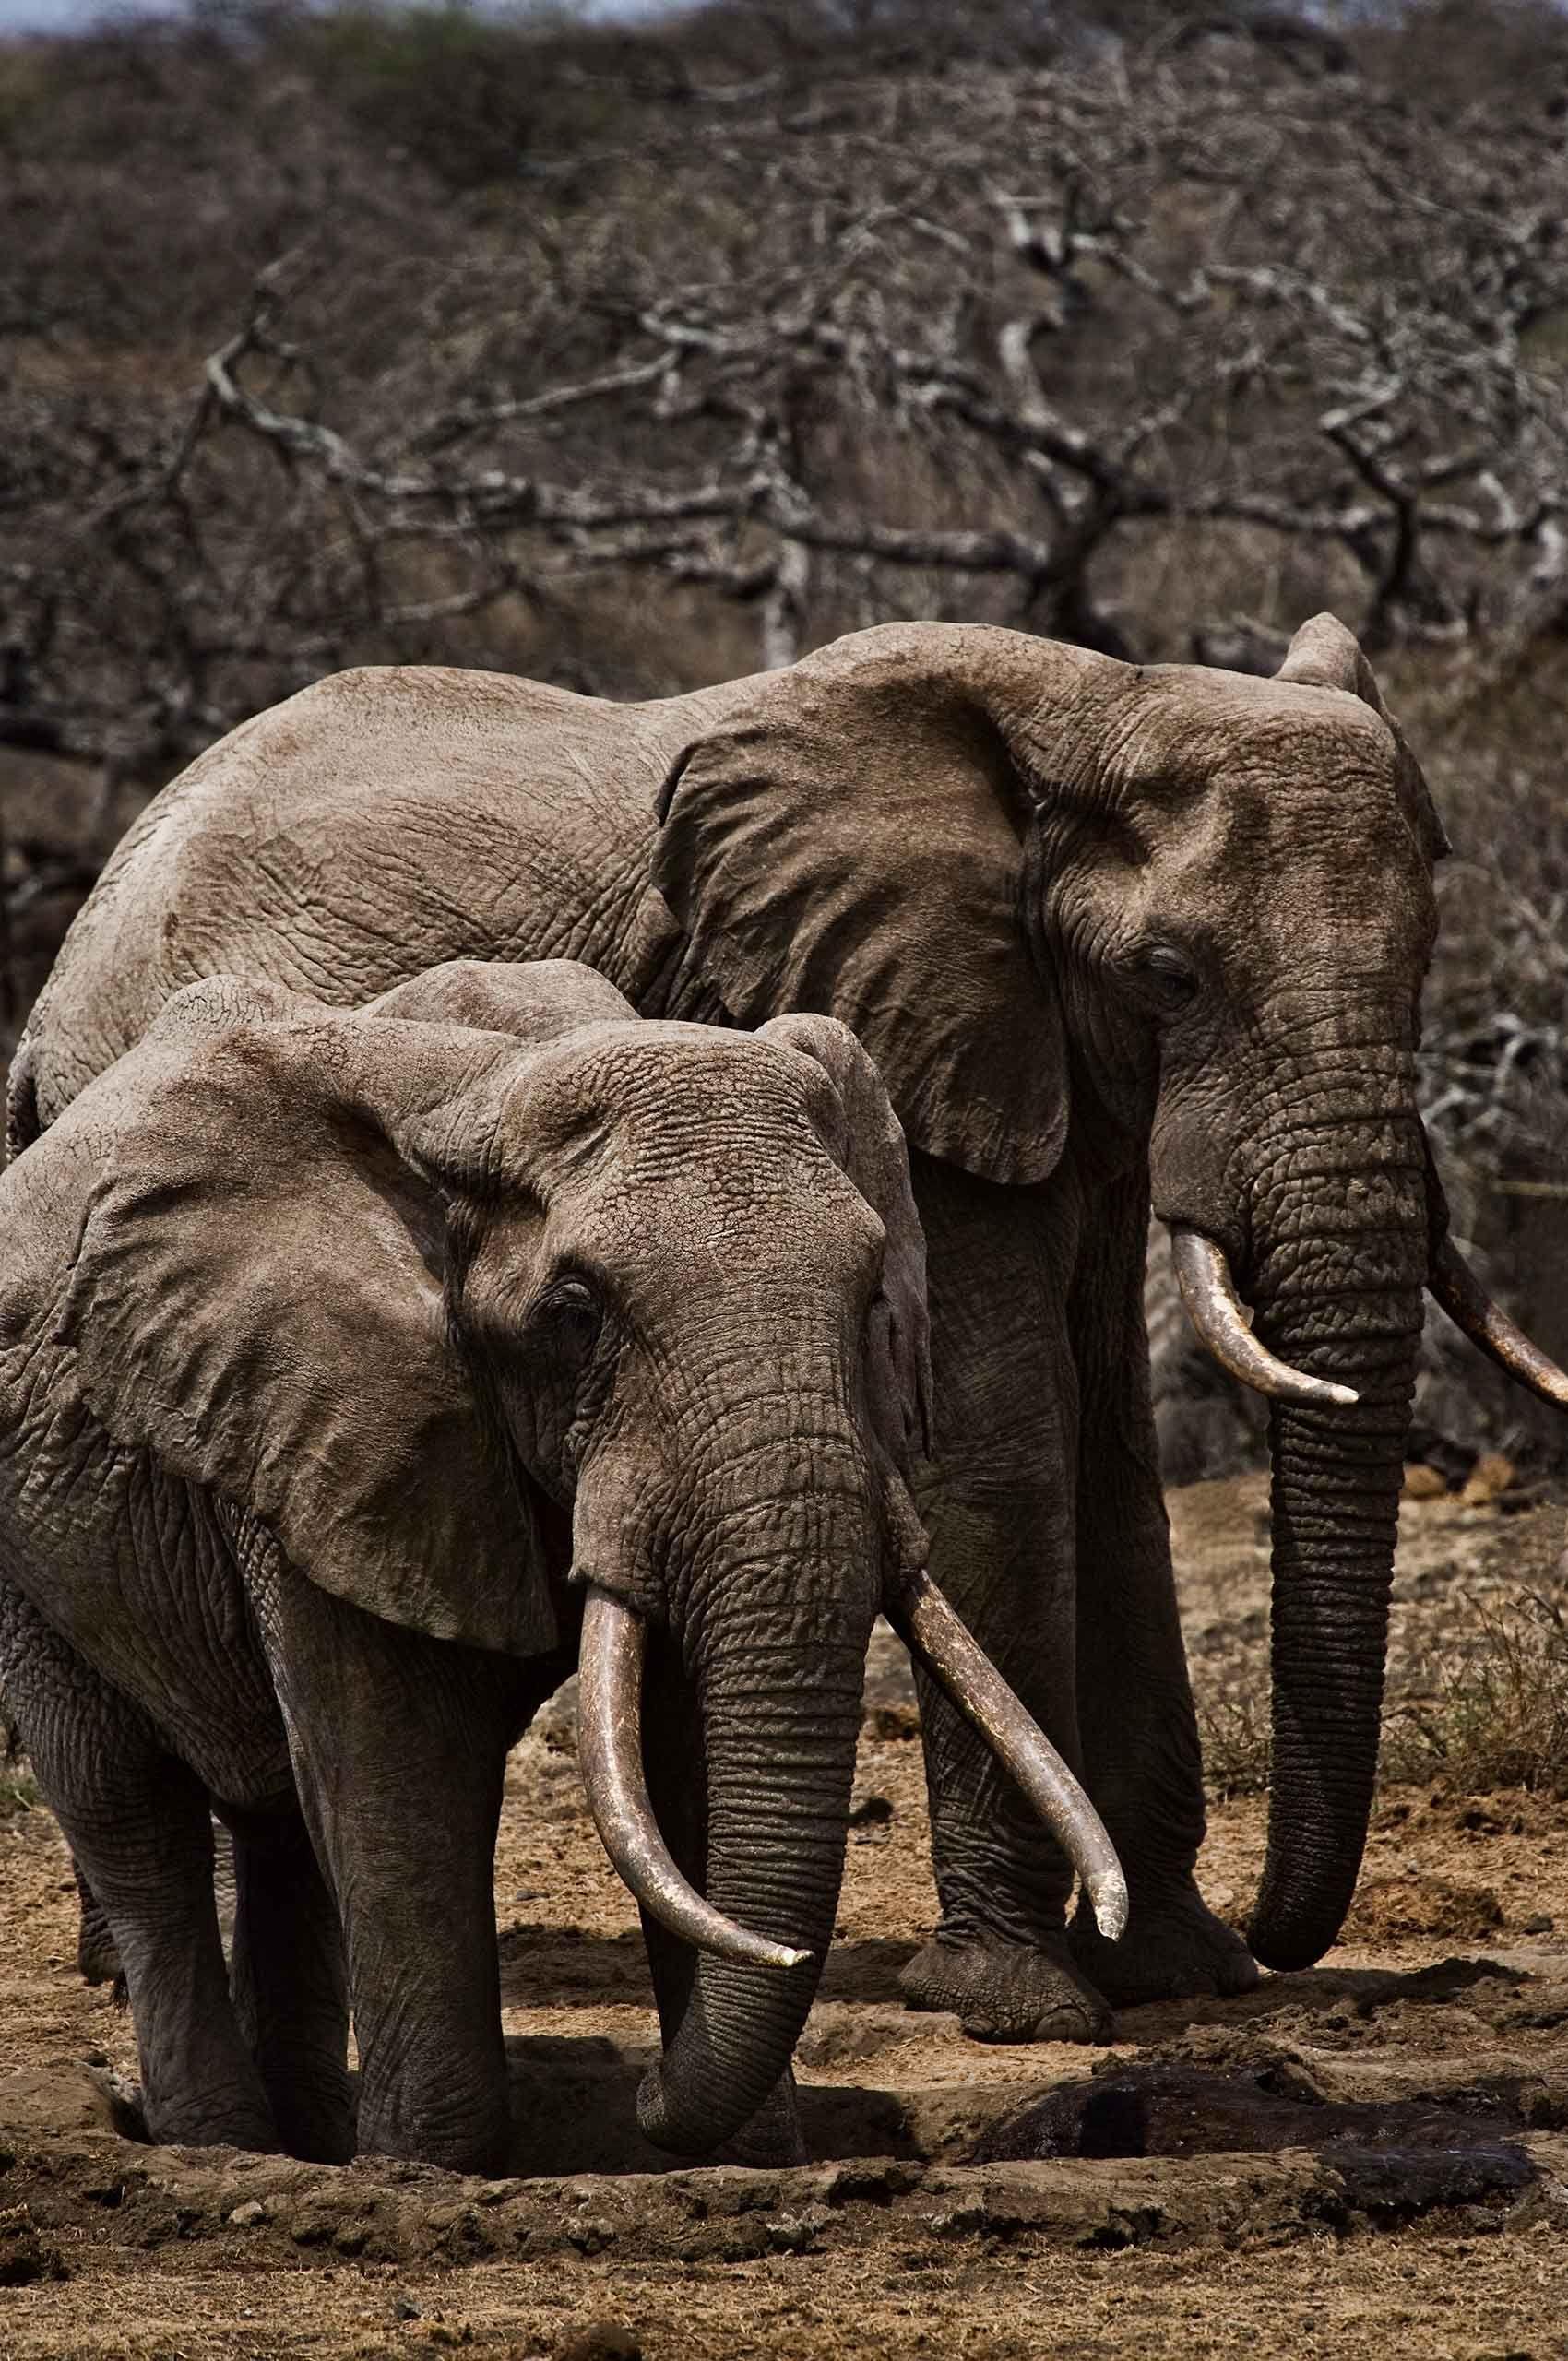 elephants-kenya-by-henrikolundphotography.jpg